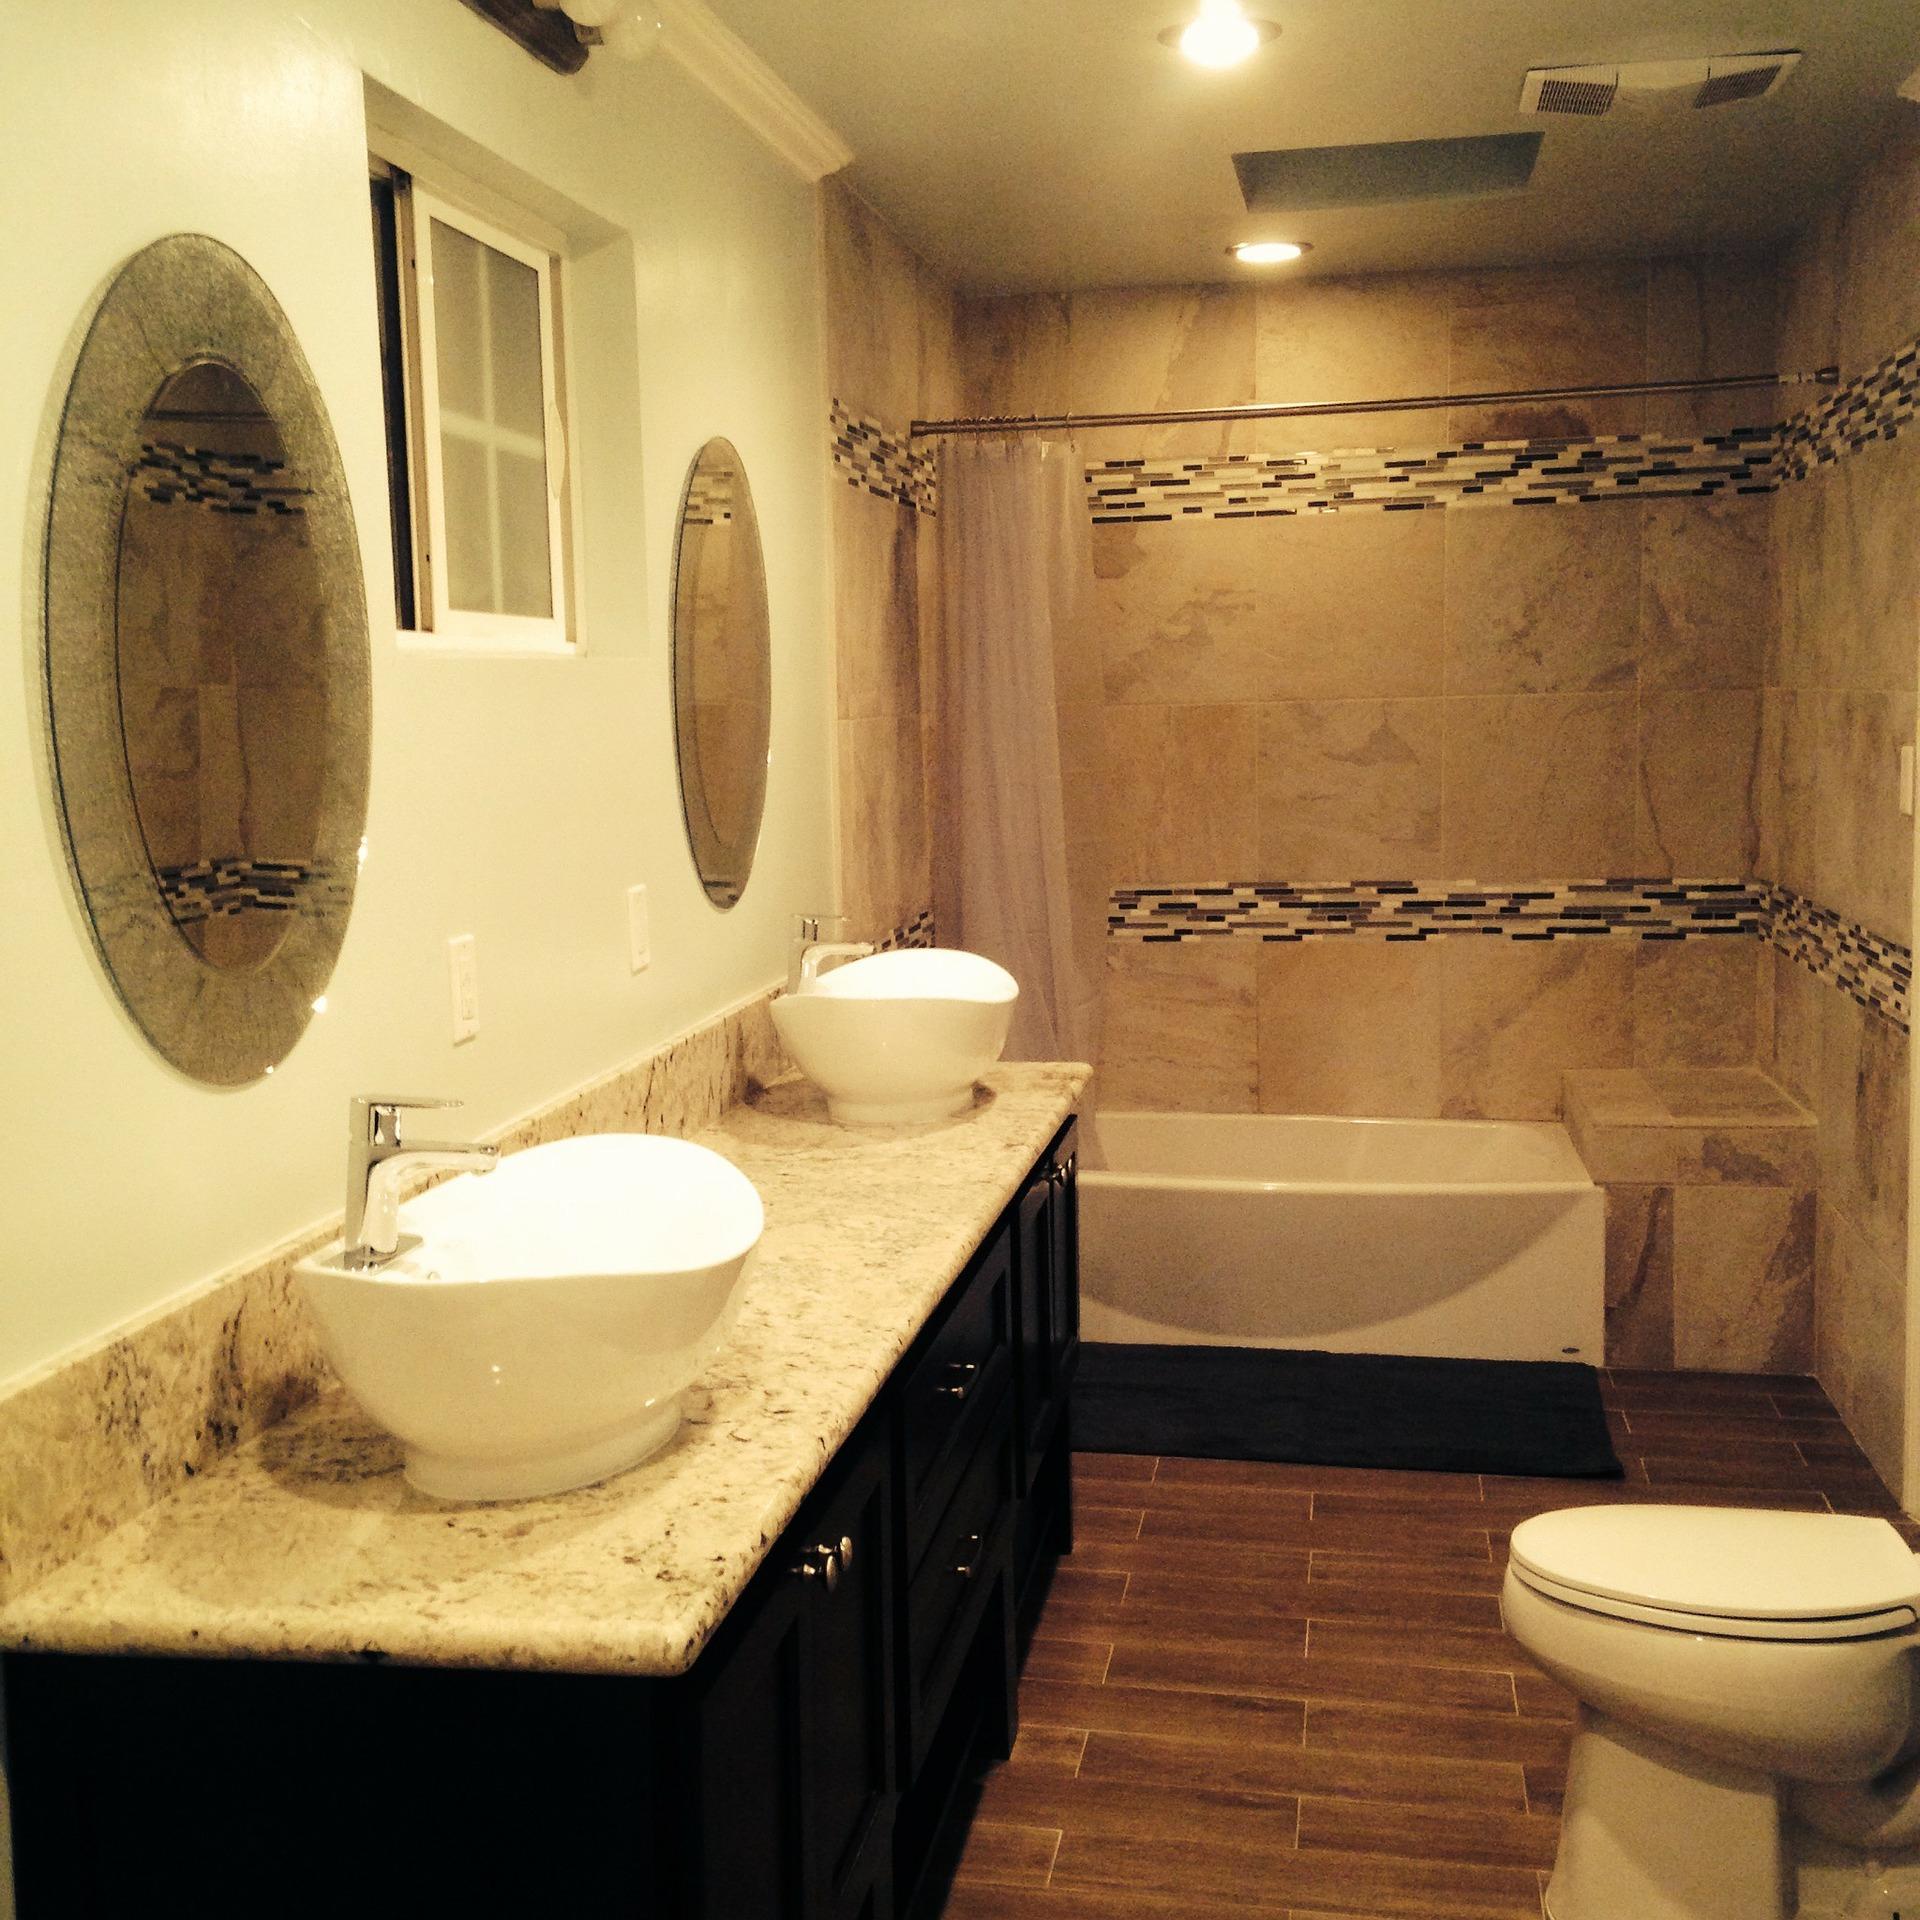 bathroom-335748_1920.jpg